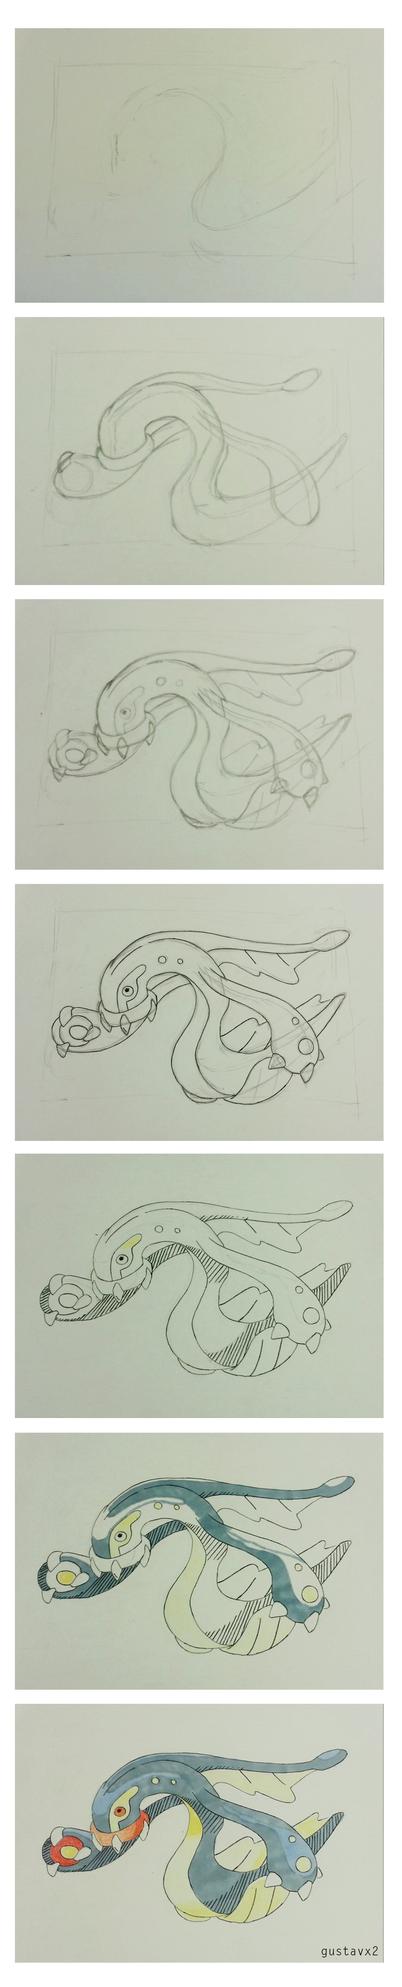 Eelektross (Pokemon) step-by-step by gustavx2